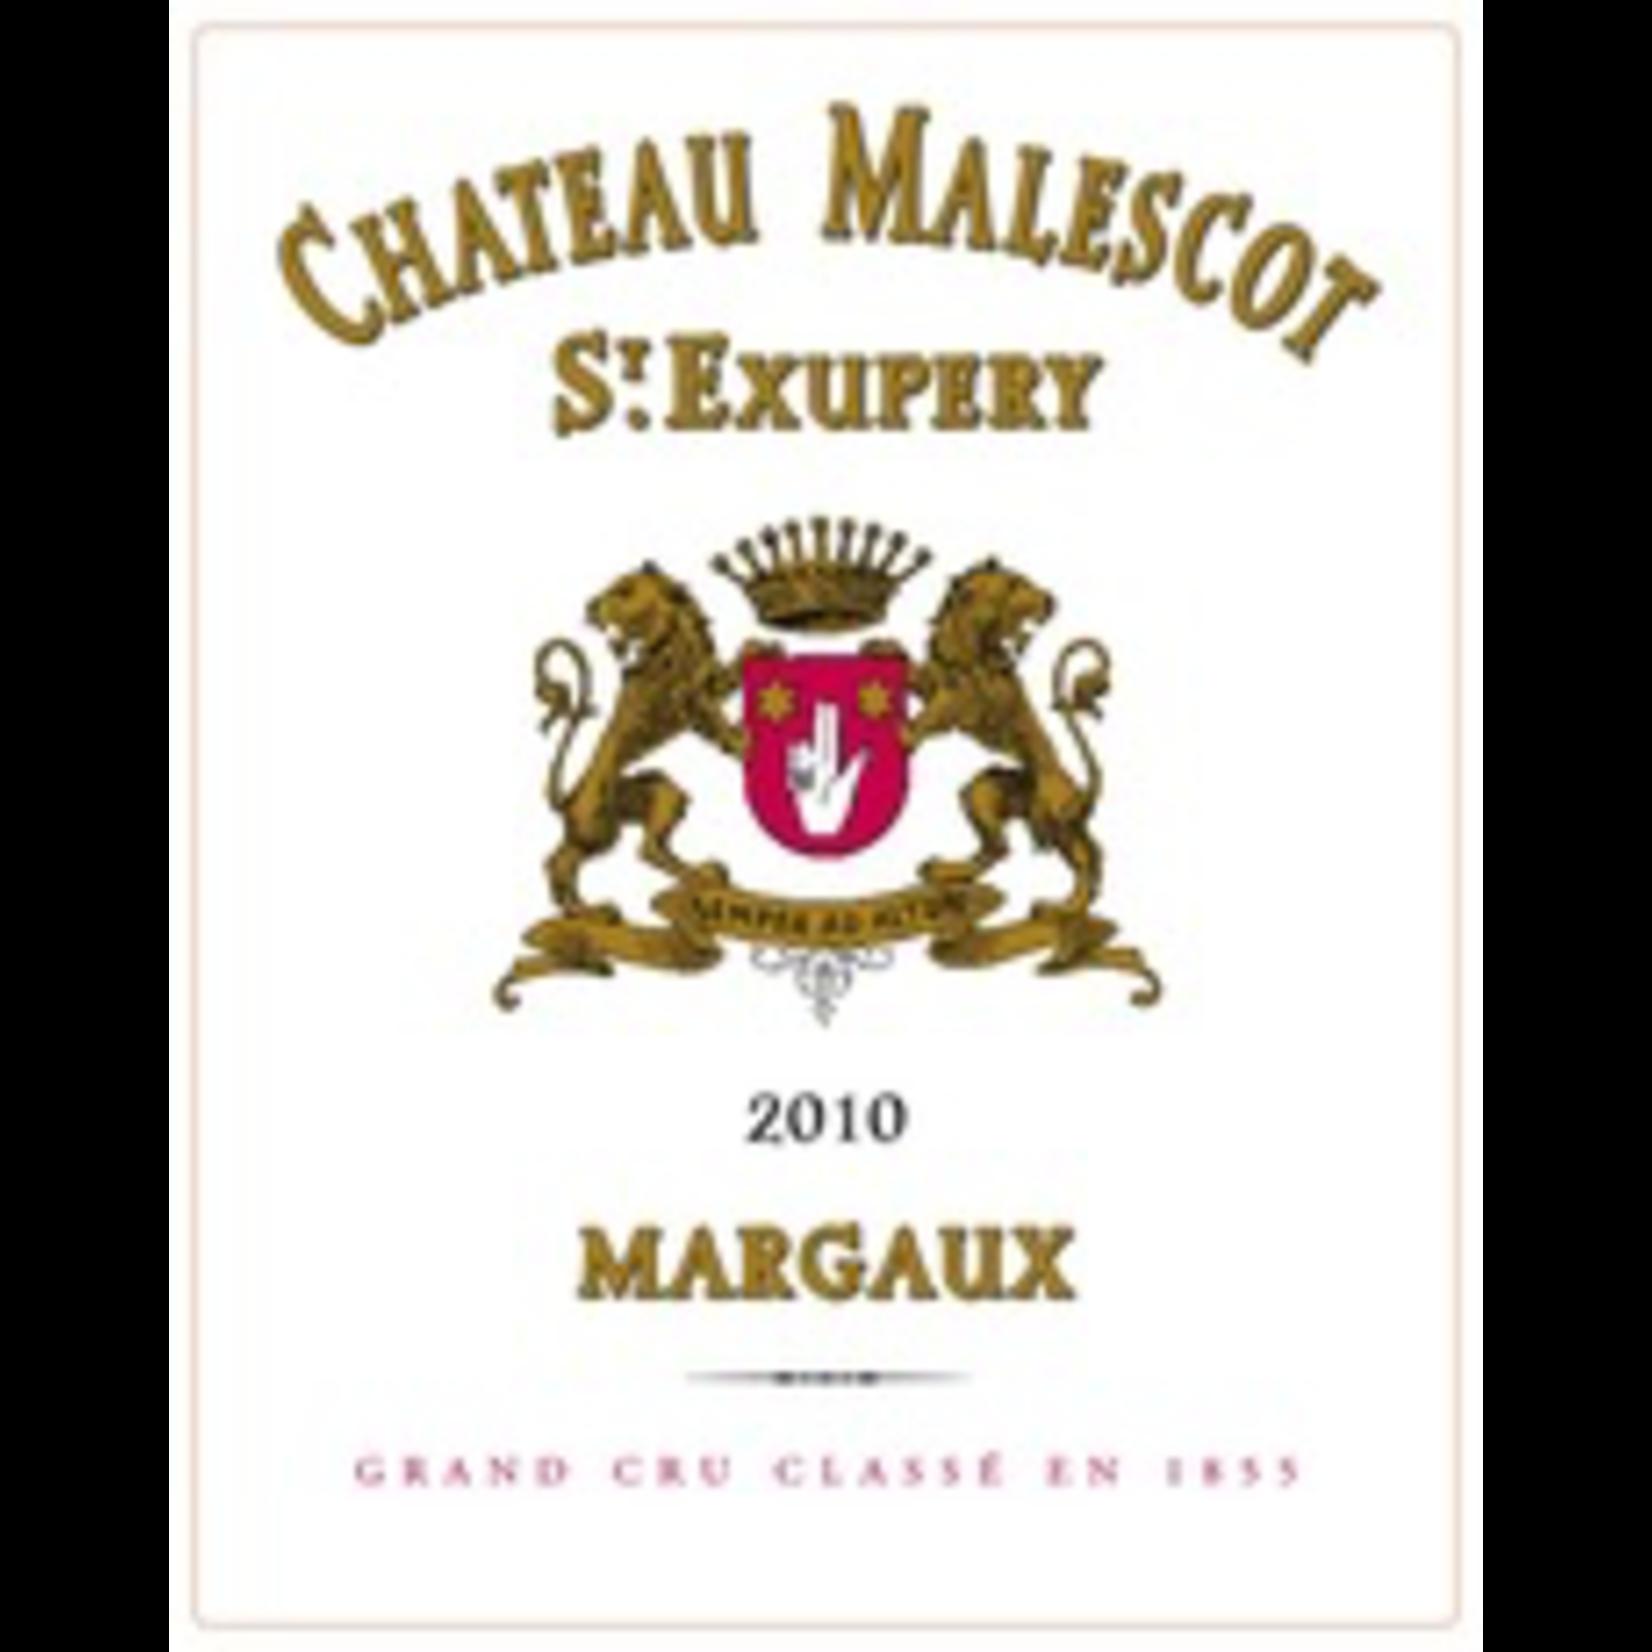 Wine Chateau Malescot Saint Exupery 2010